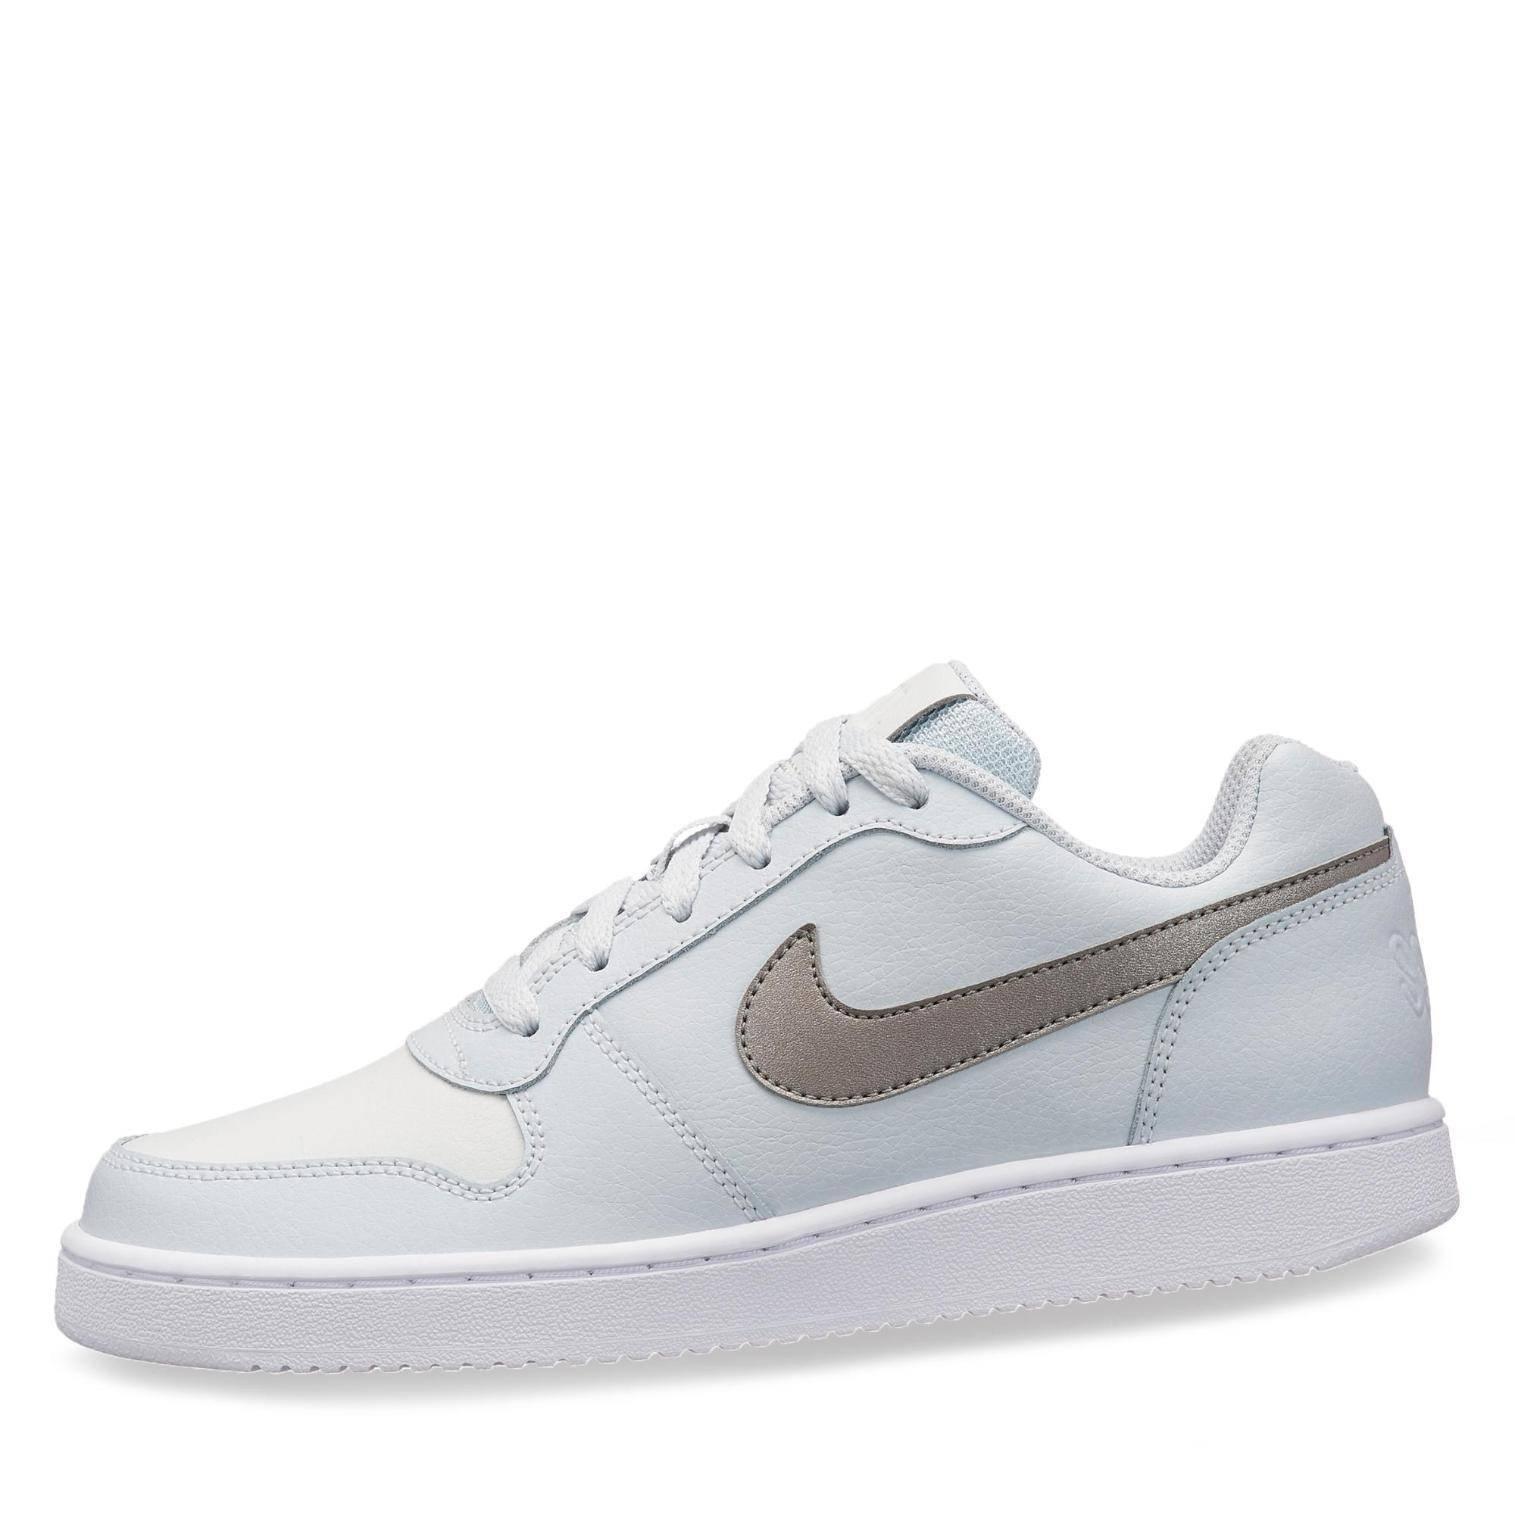 fa11b9198a5ca0 25% Rabatt auf Nike Ebernon Sneaker - Damen - weiß in Größe 39 jetzt ...